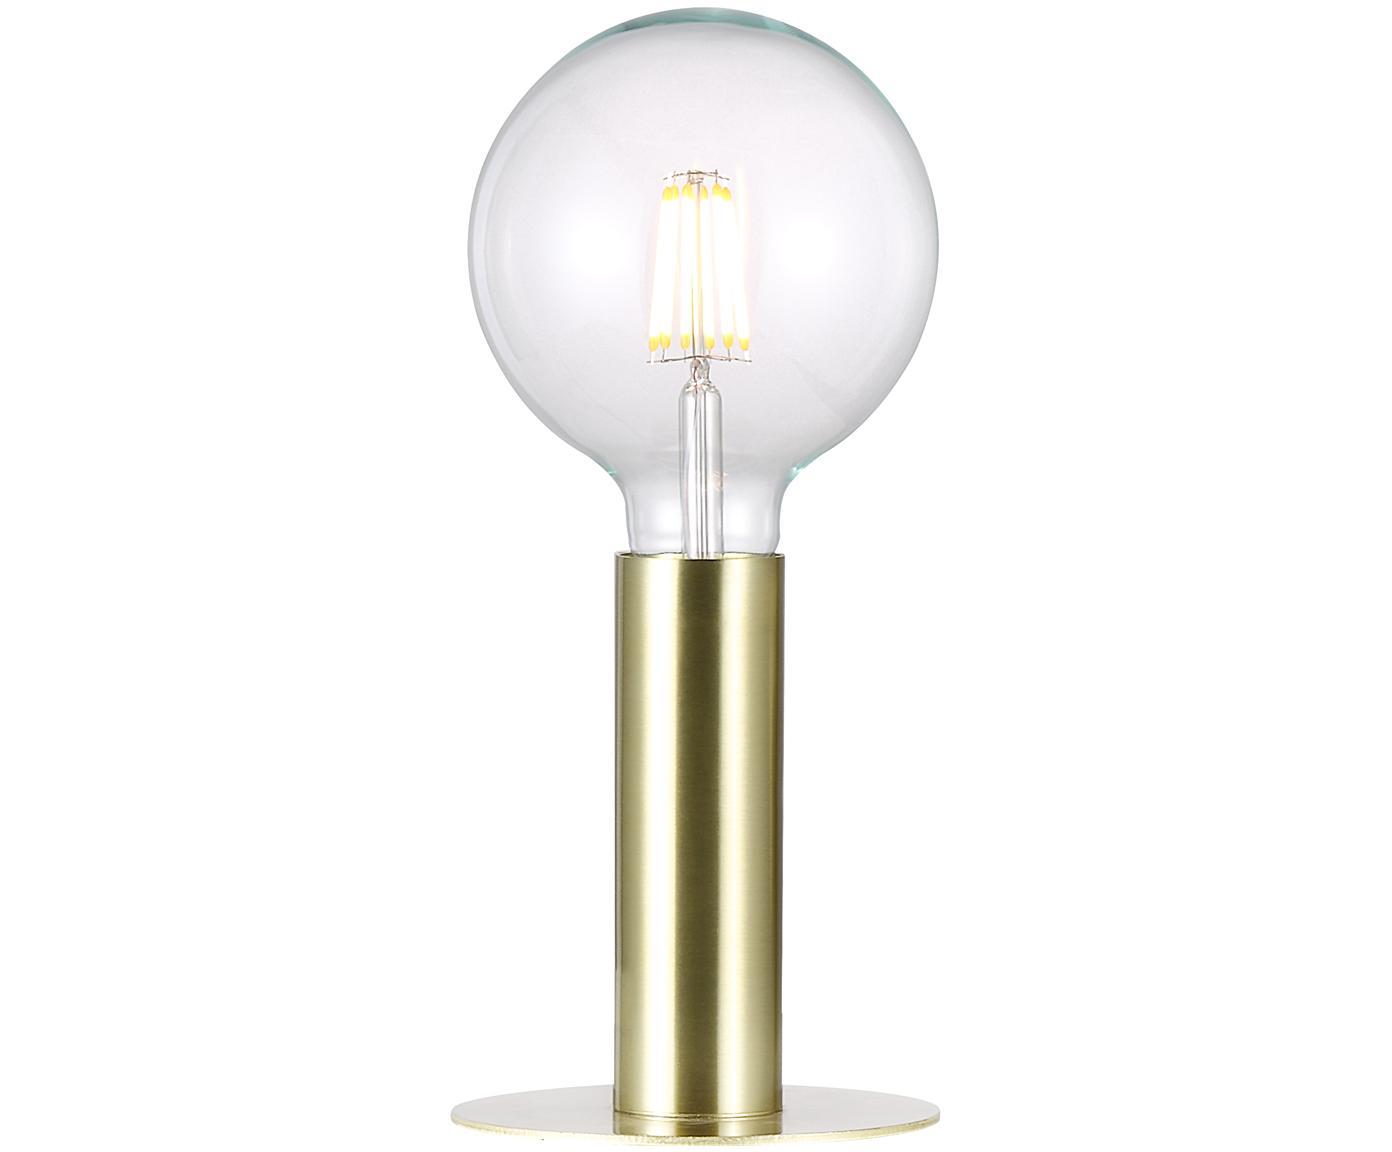 Lampada da tavolo in ottone Dean, Ottone, Ottone, Ø 13 x Alt. 15 cm